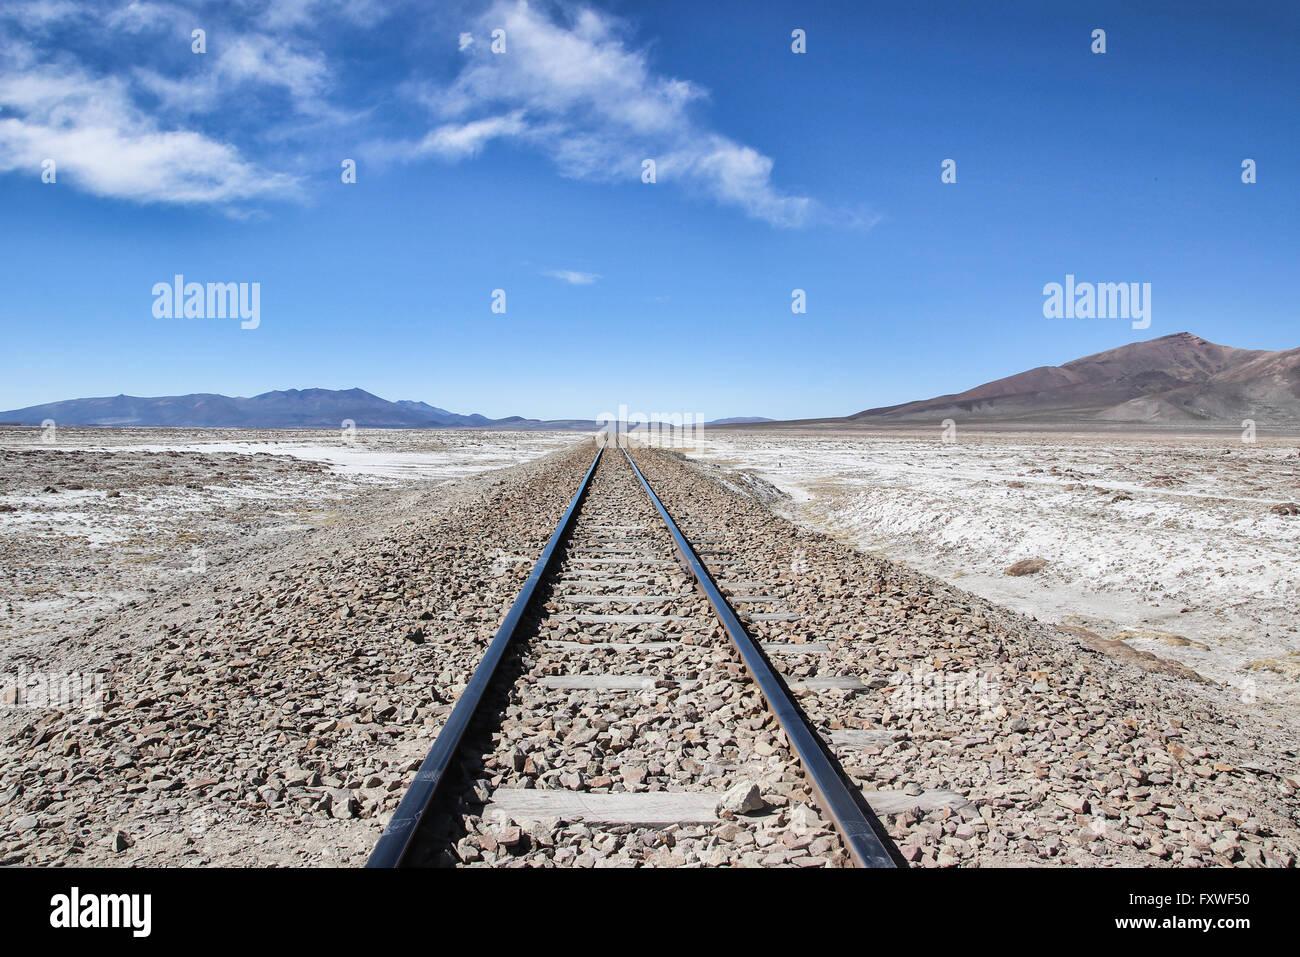 Bolivie - 21/08/2013 - Bolivie / Salar de Uyuni / Uyuni Uyuni, désert de sel - Isla del Pescado - Sandrine Photo Stock